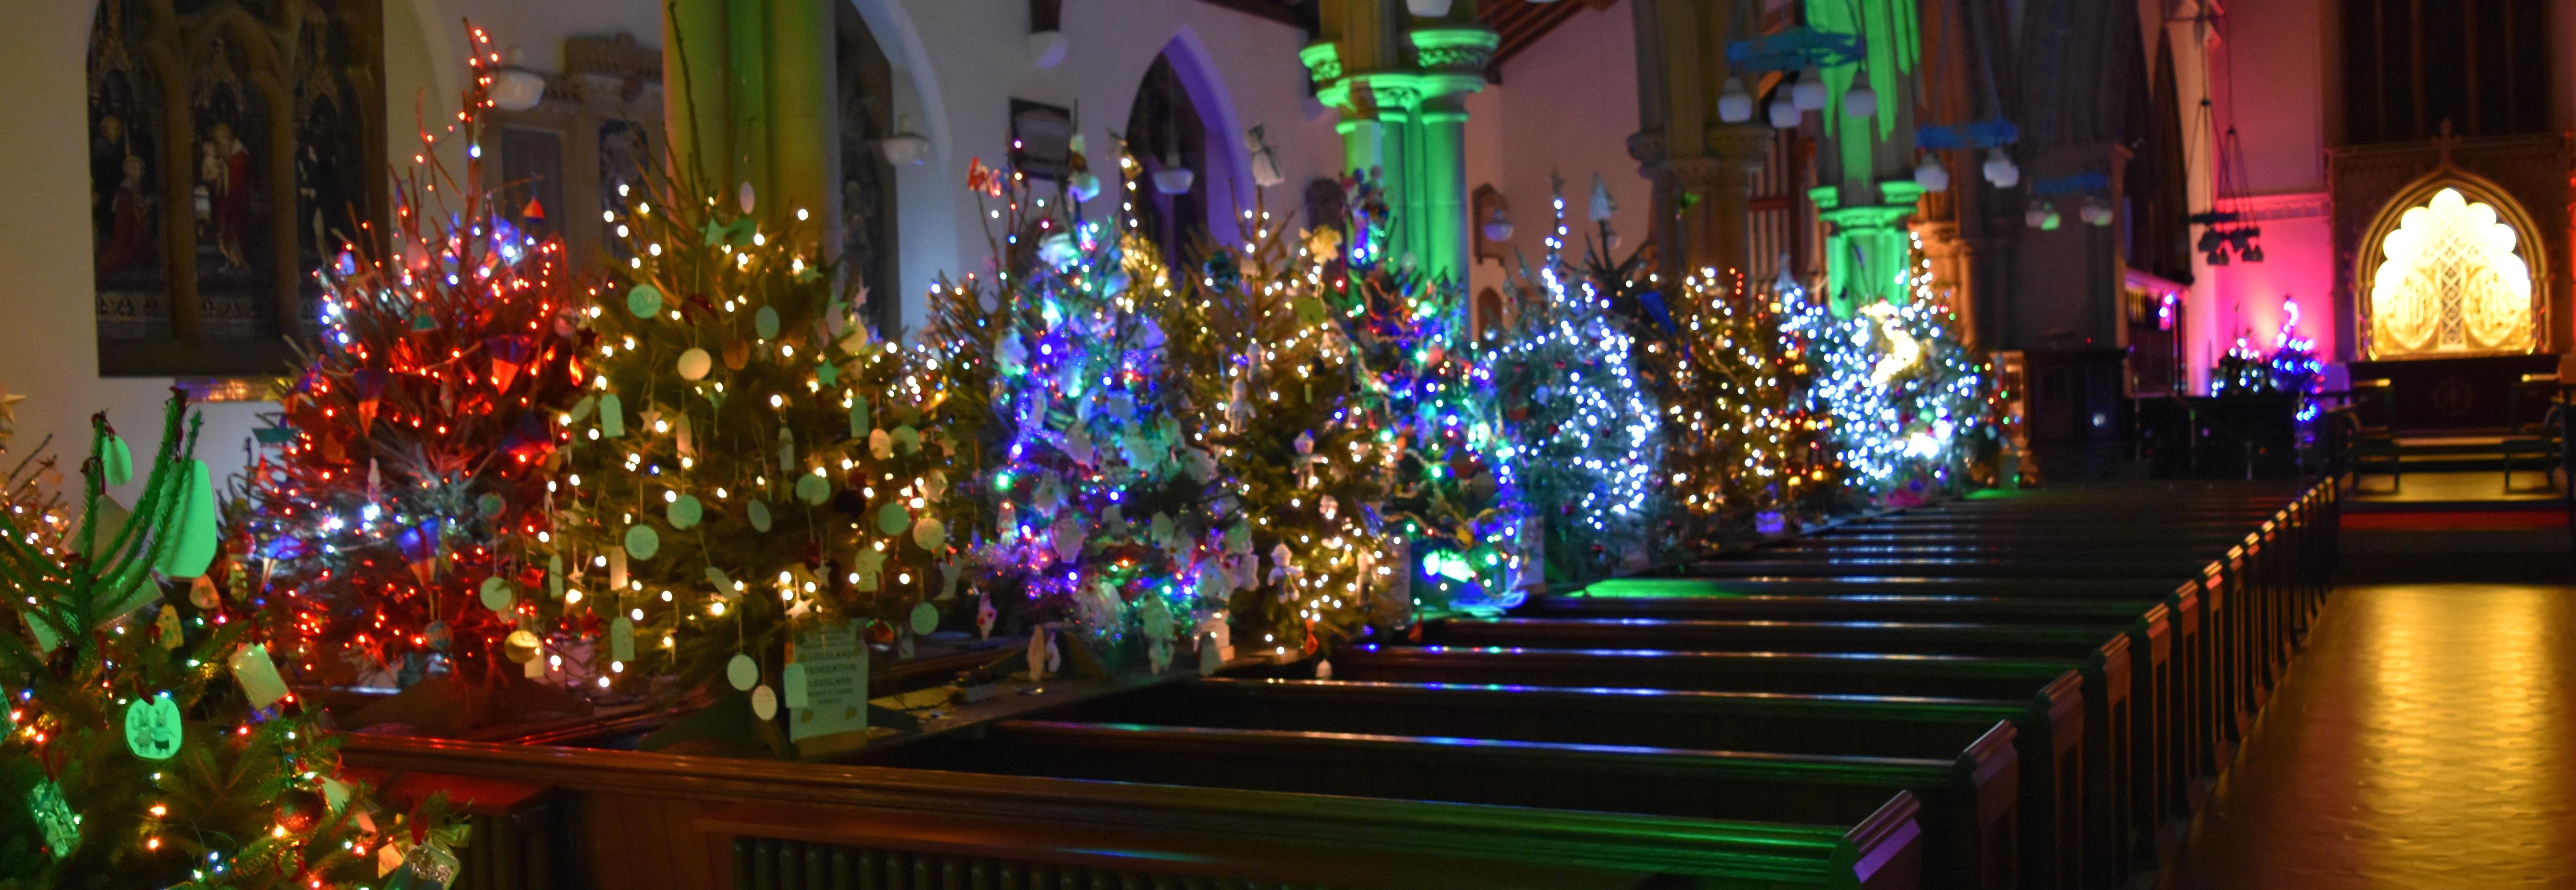 Christmas Tree Picture.Christmas Tree Festival 2019 Alverstoke Church Of England